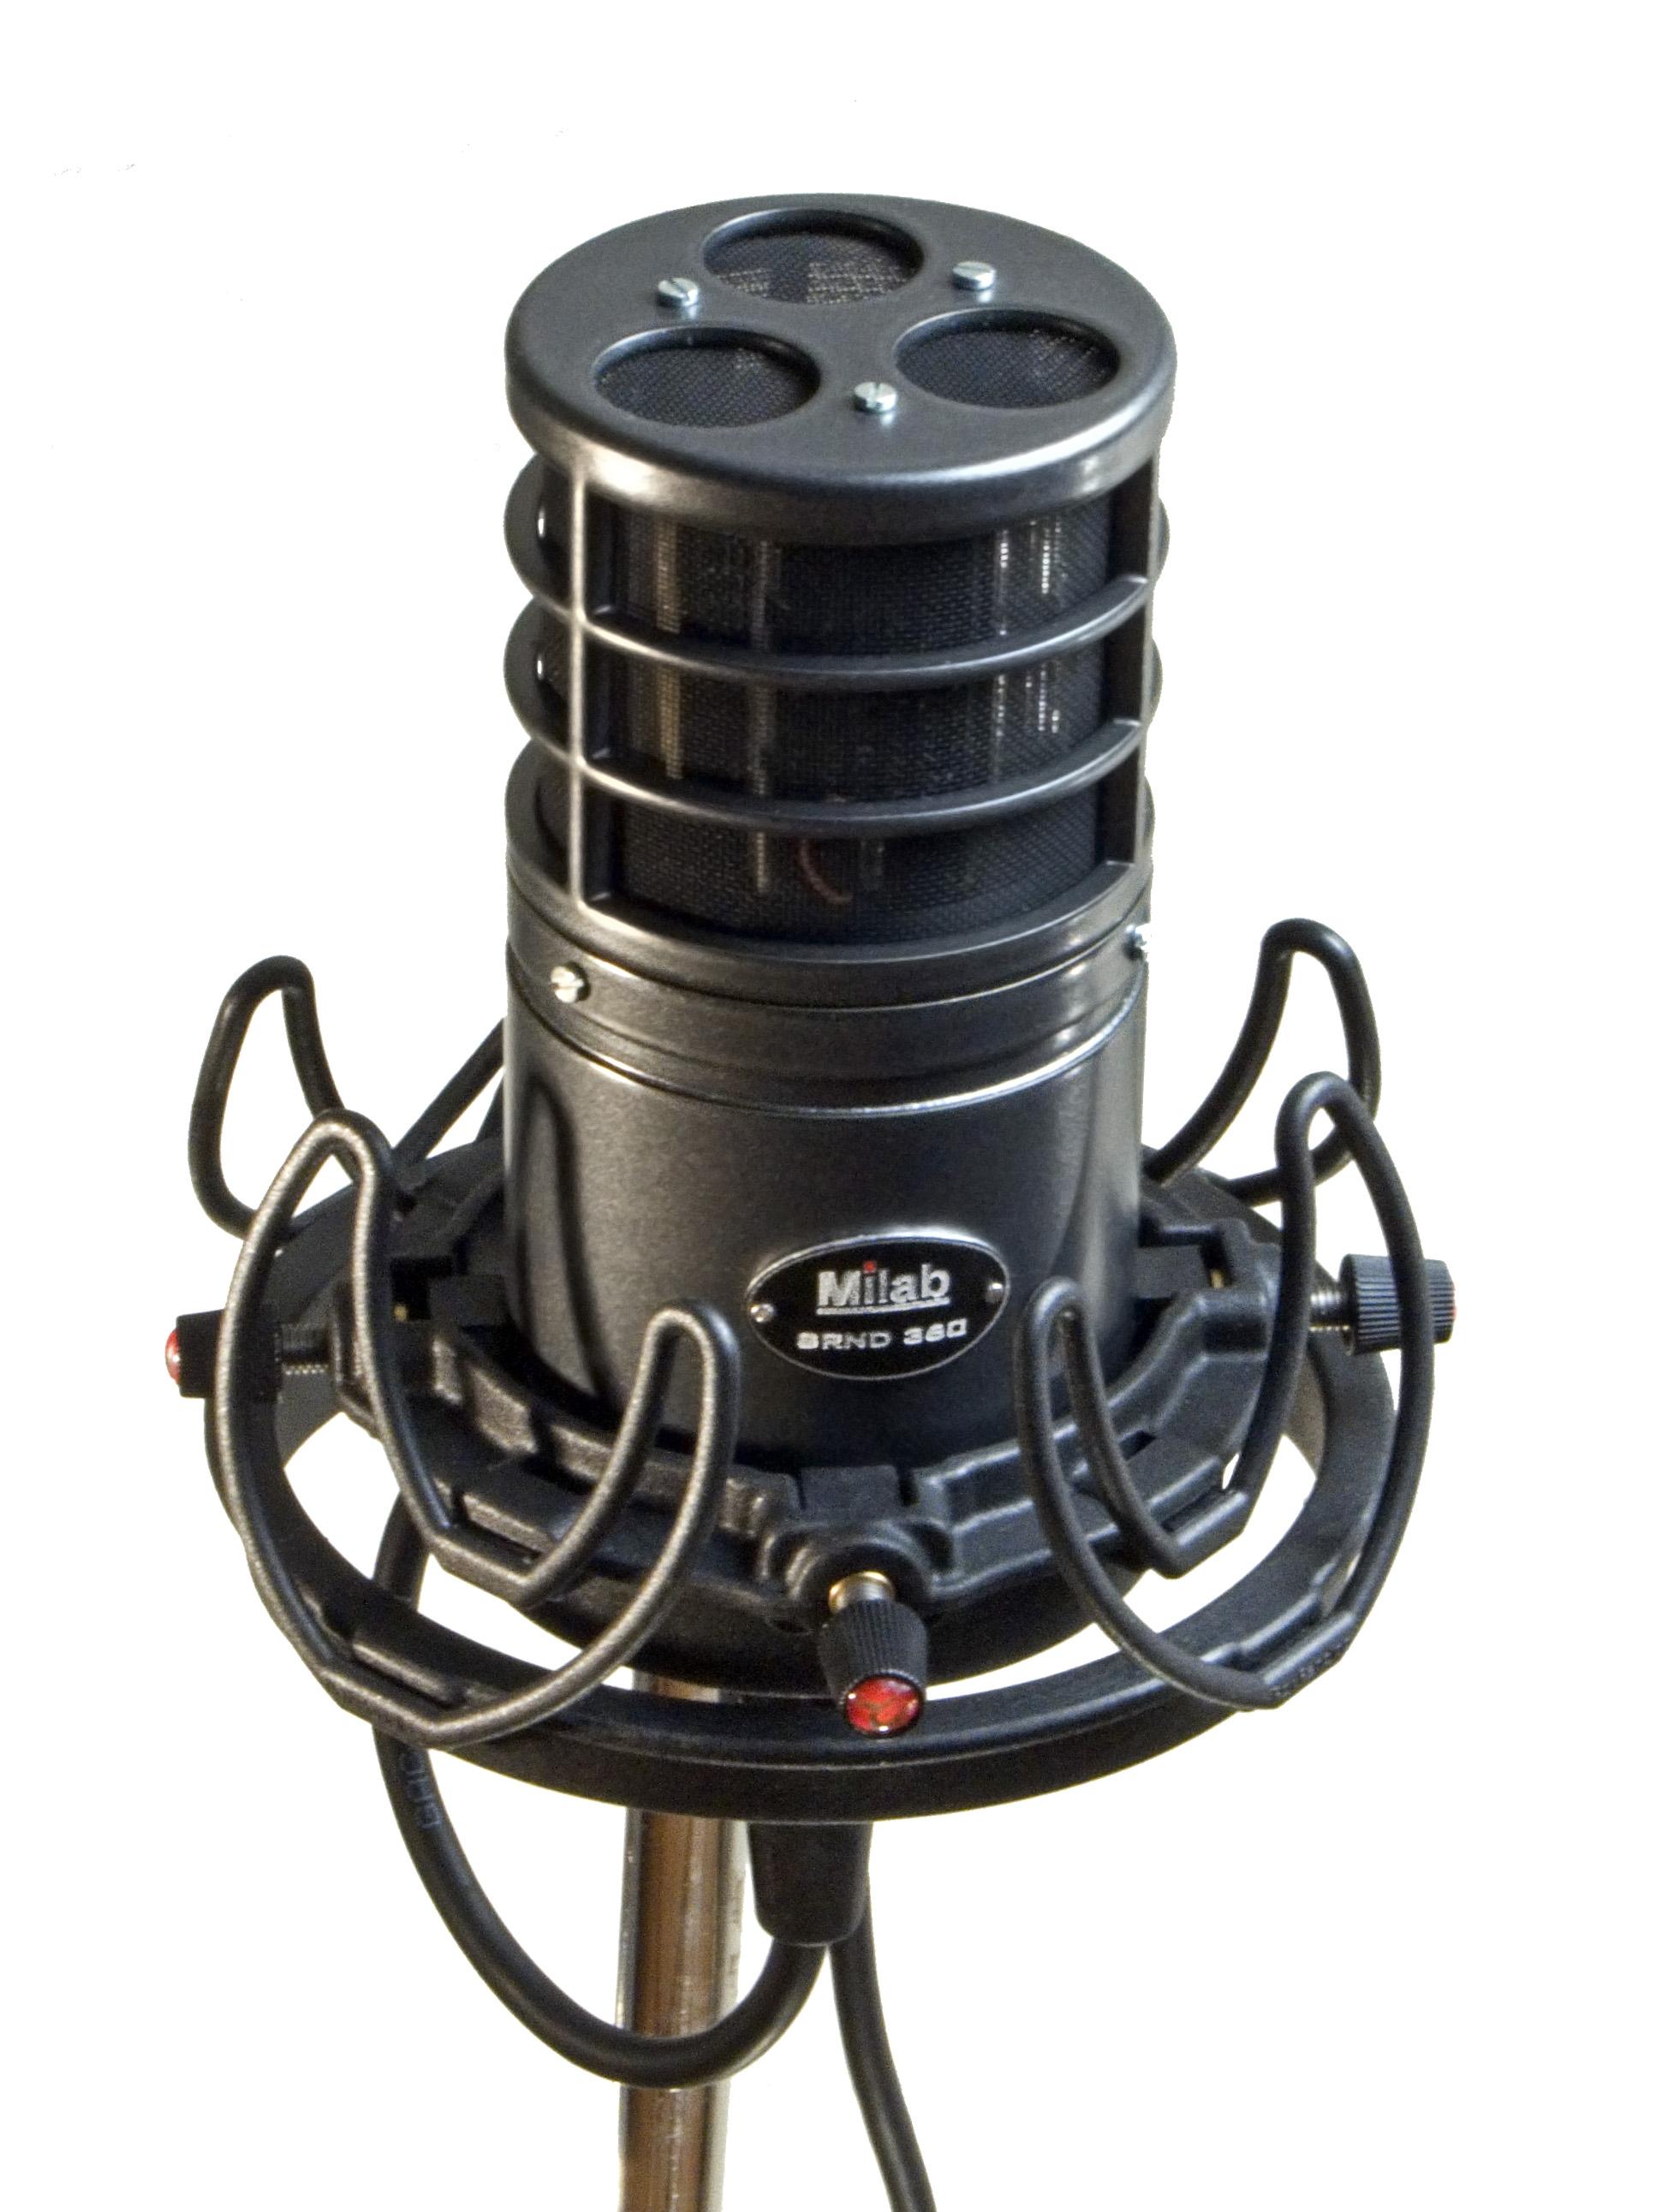 Milab SRND 360 surround-mikrofon